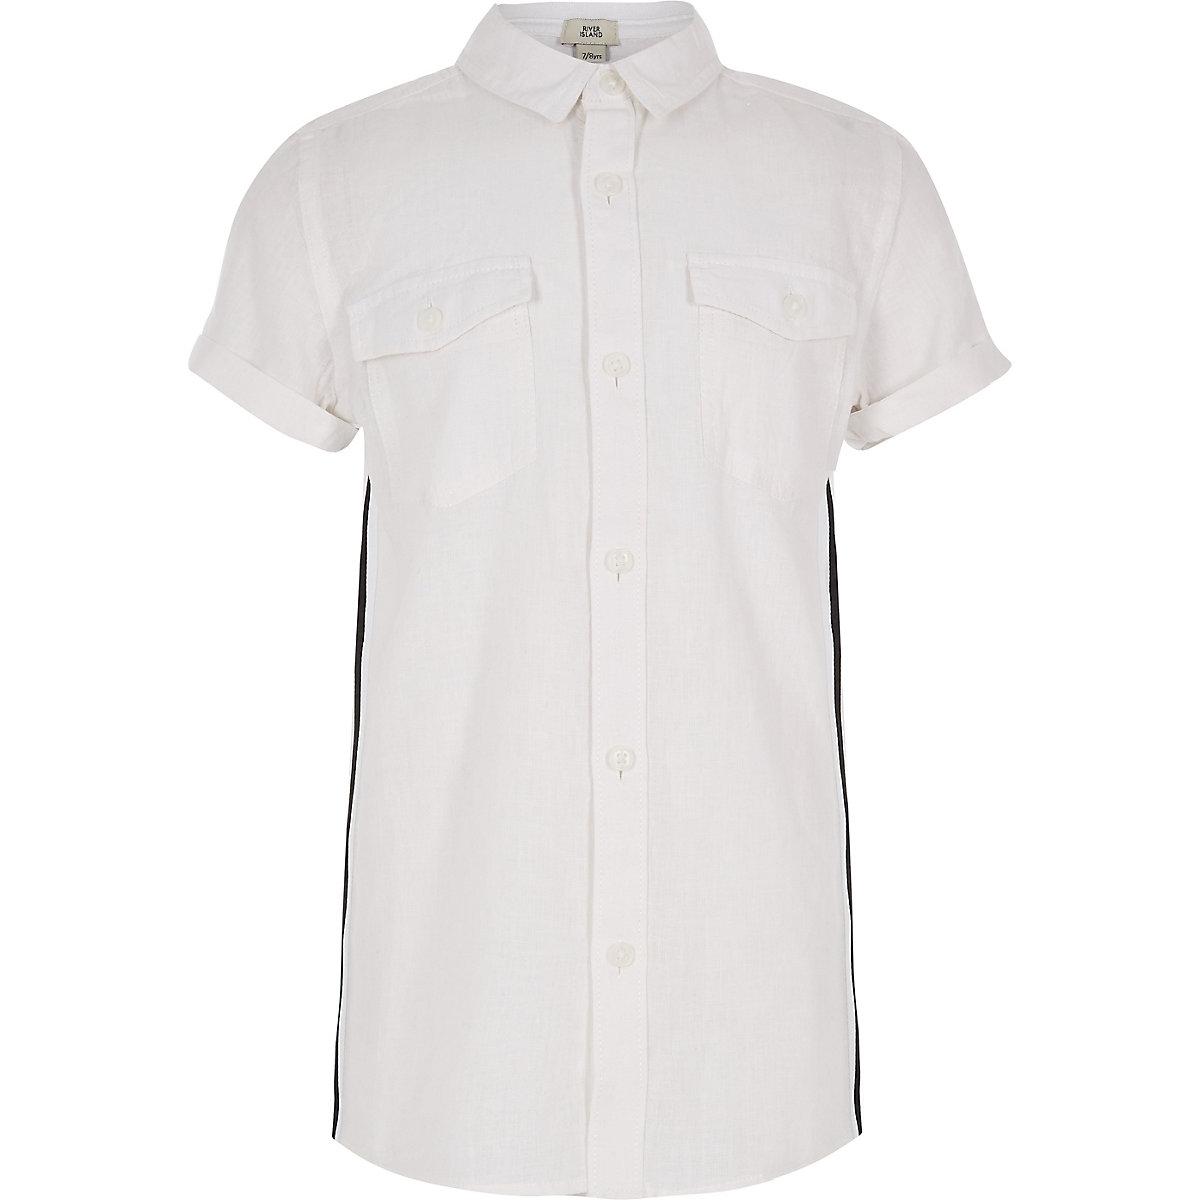 Boys white short sleeve tape shirt